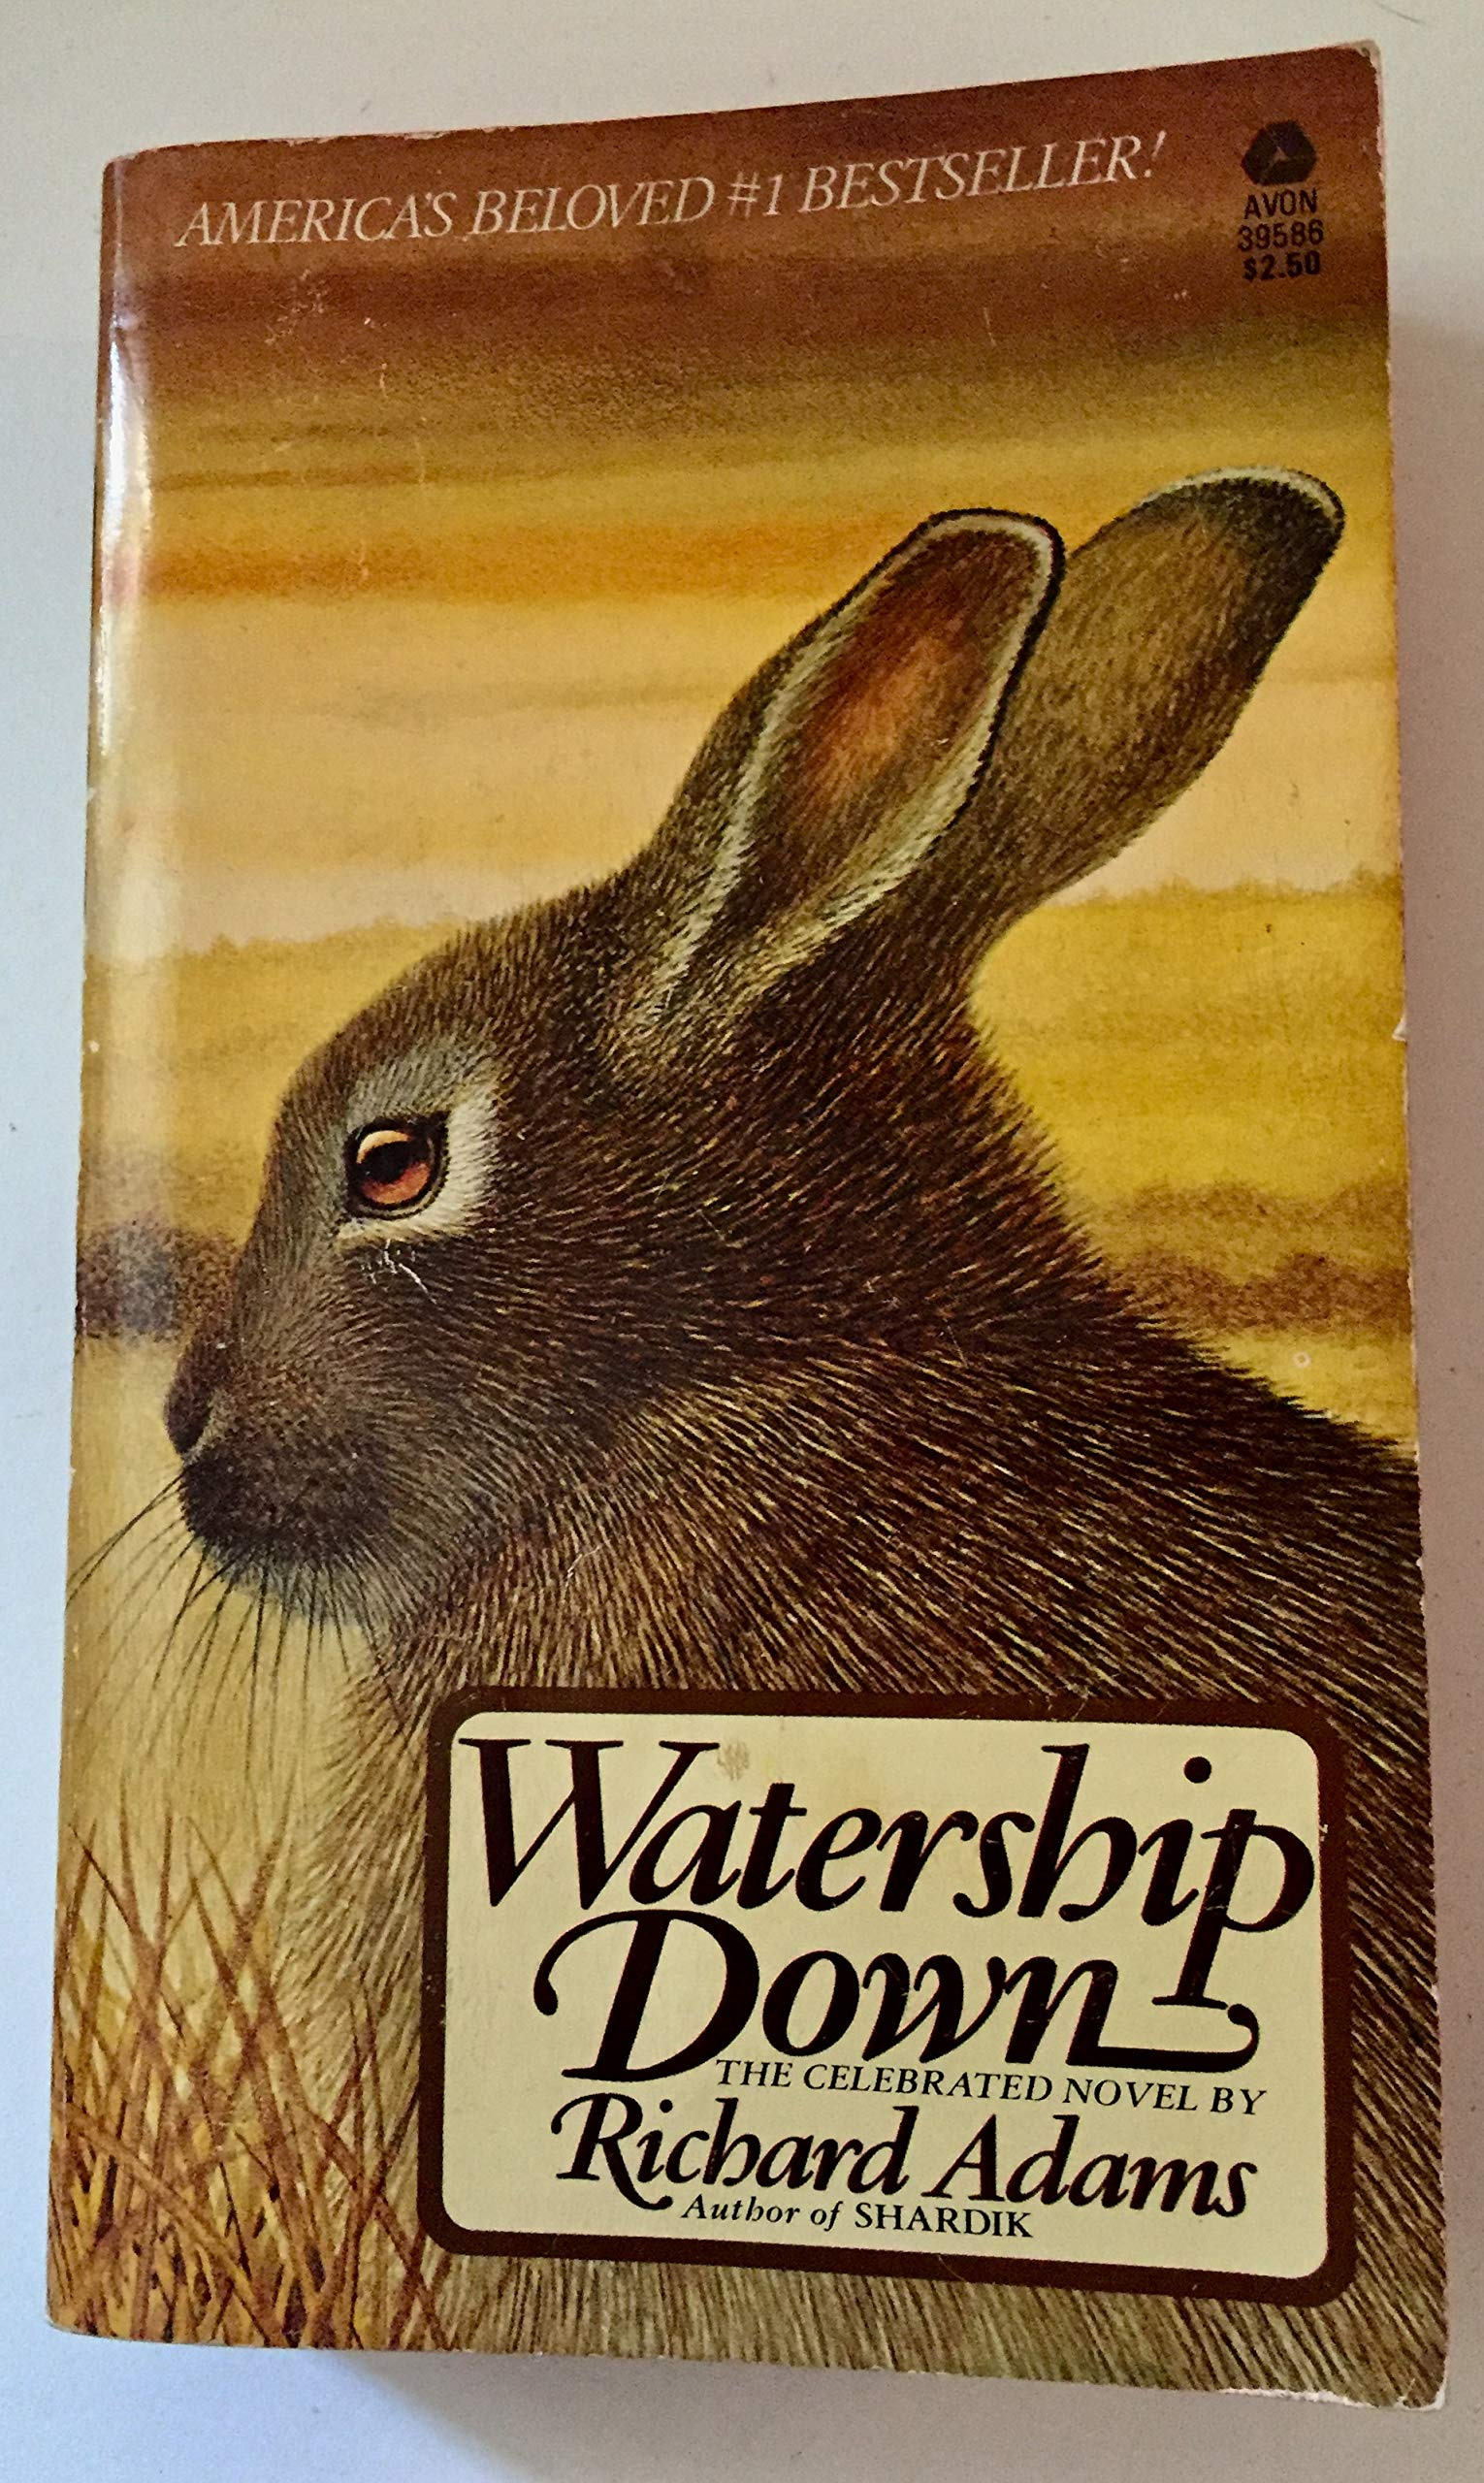 when was watership down written